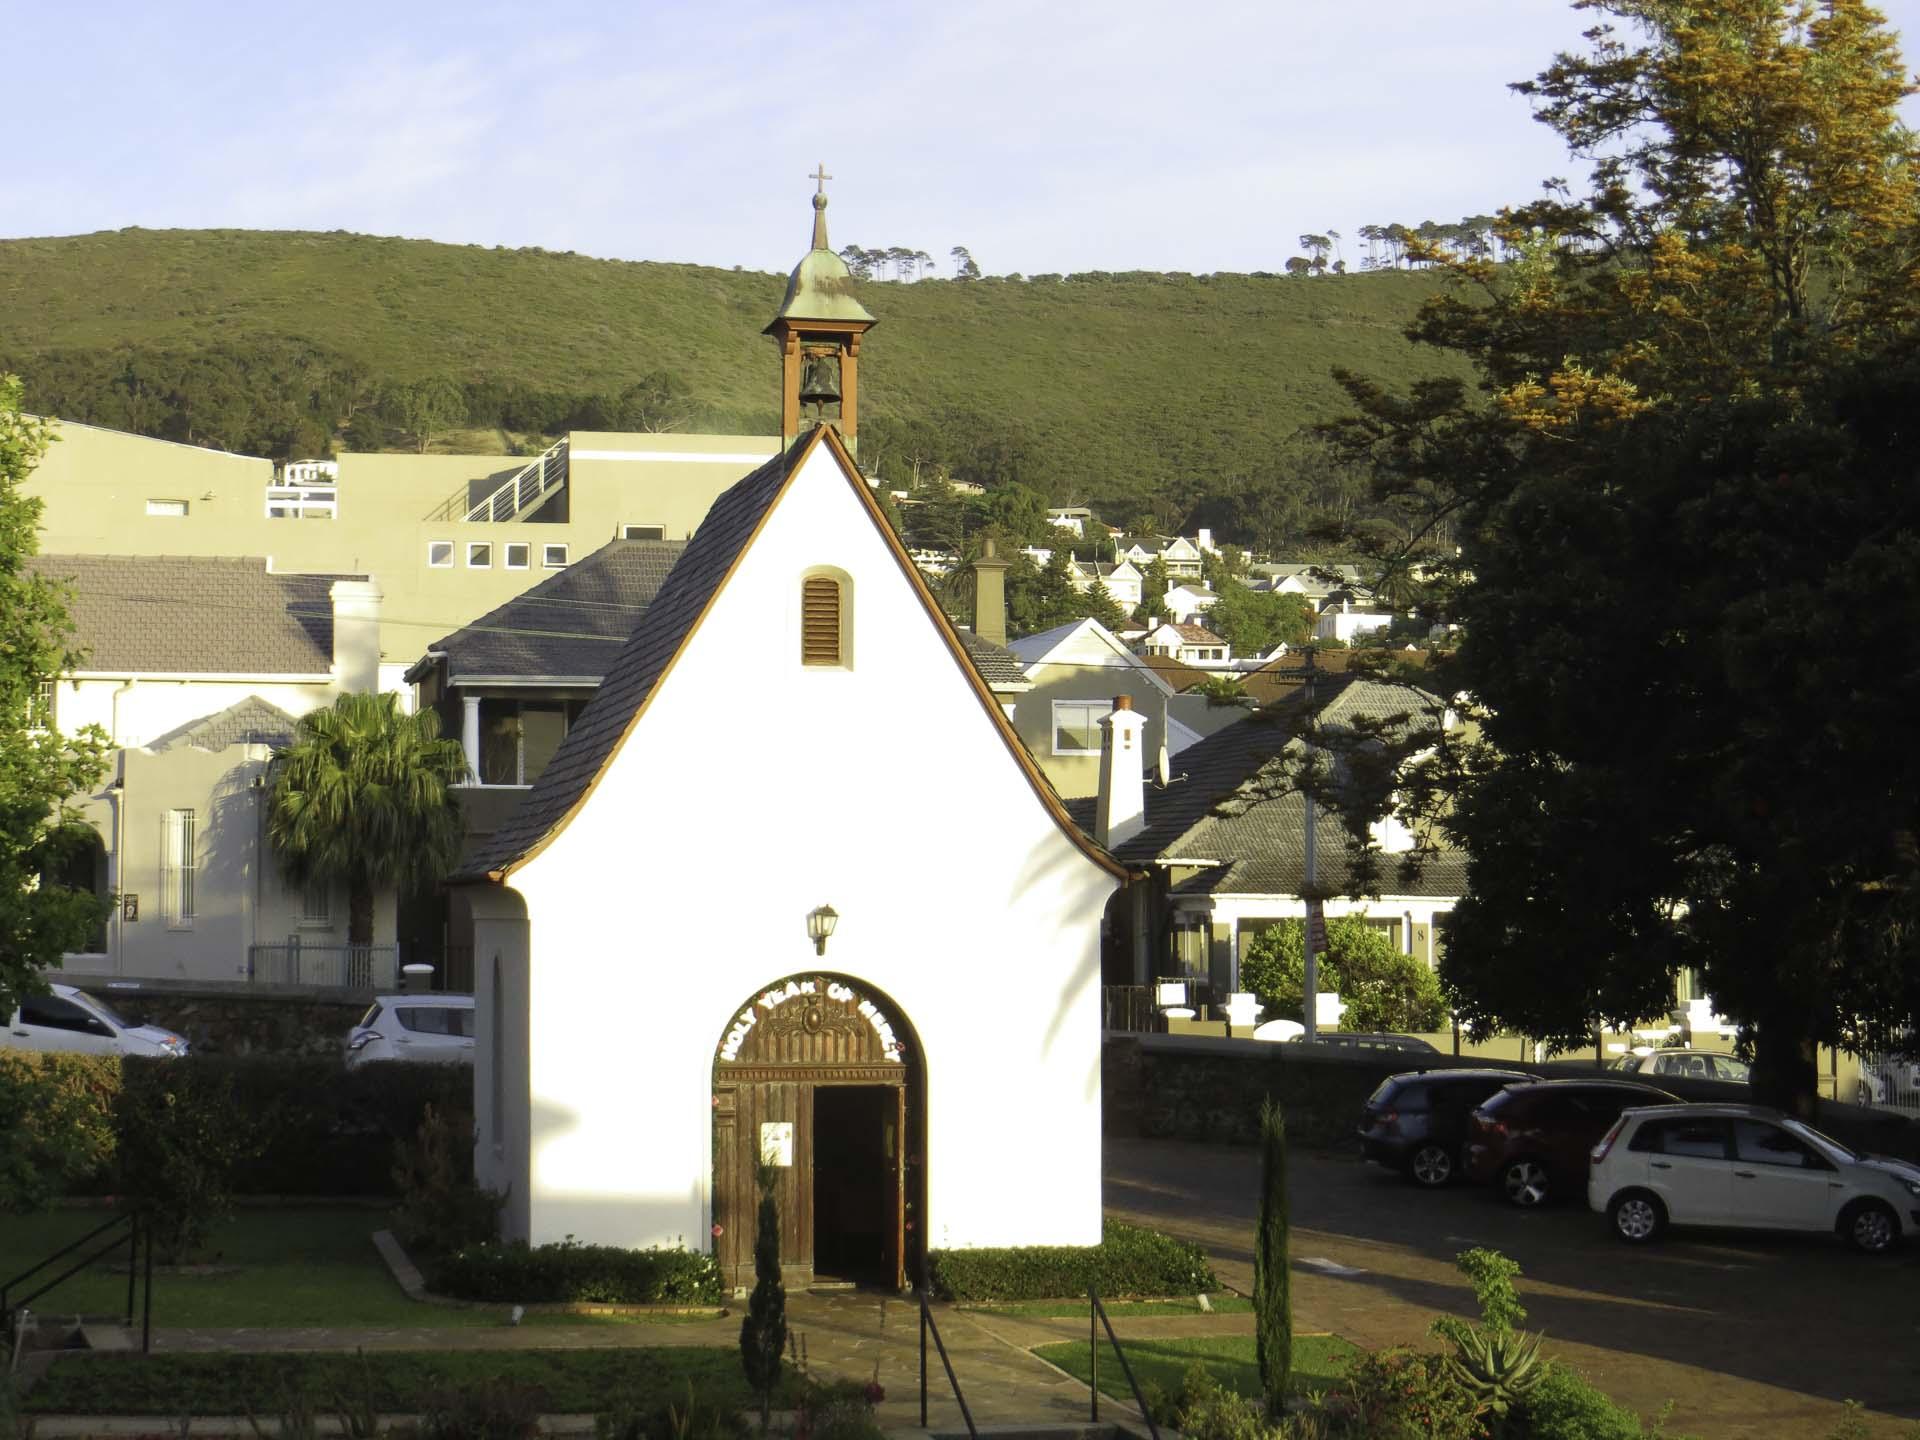 untitled 9336 of 13636 Schoenstatt Sisters South Africa 1920x1440